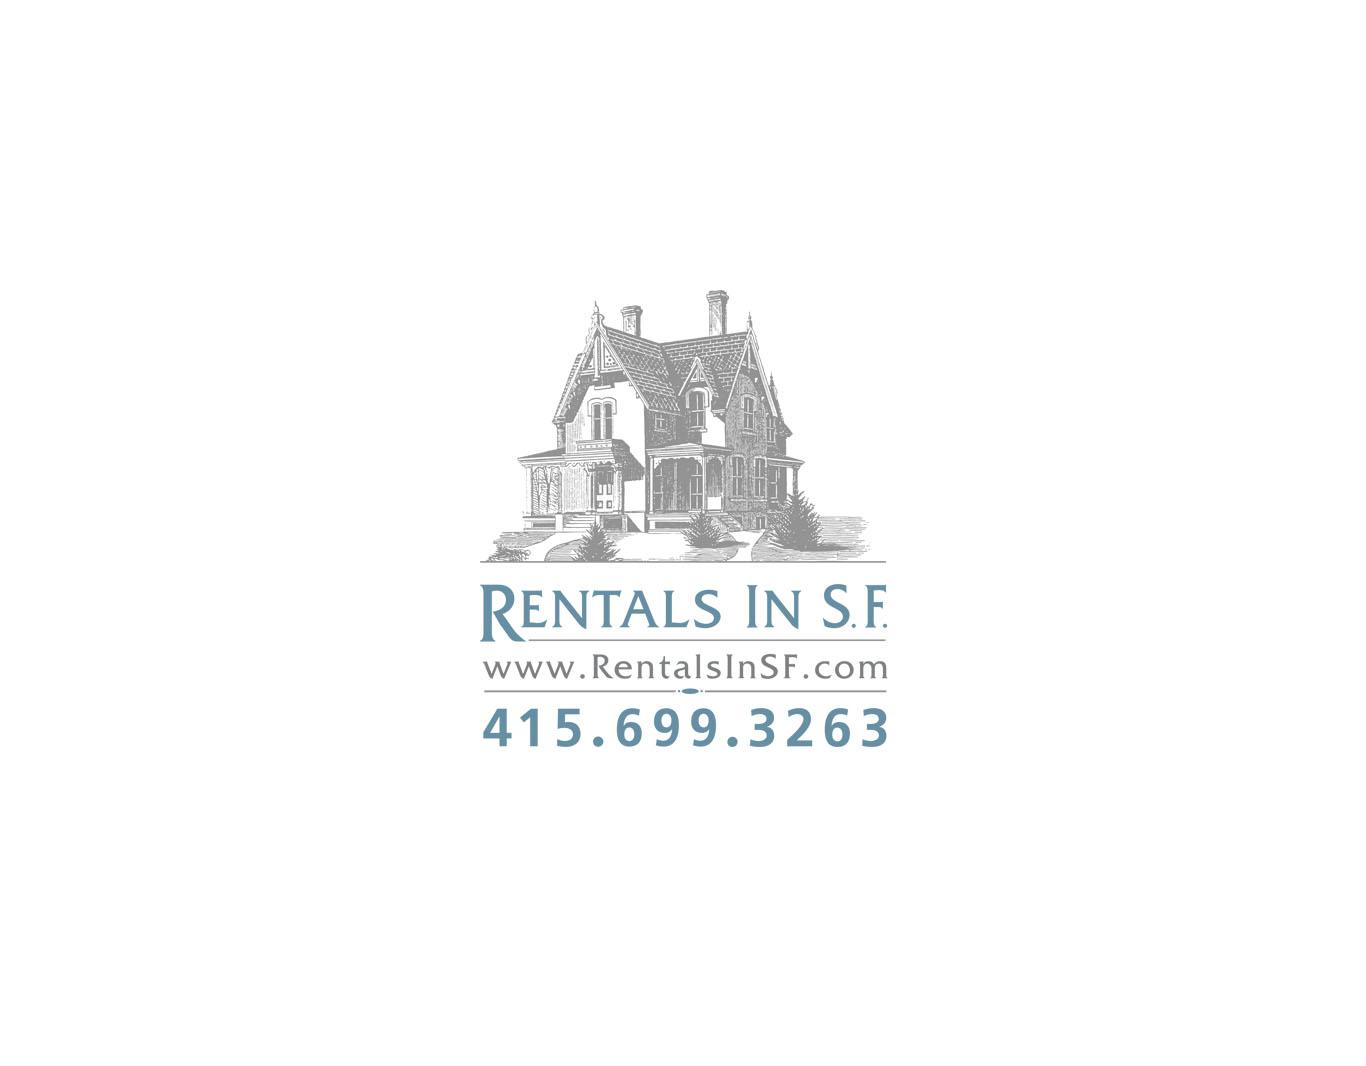 Campaign- Rentals in SF